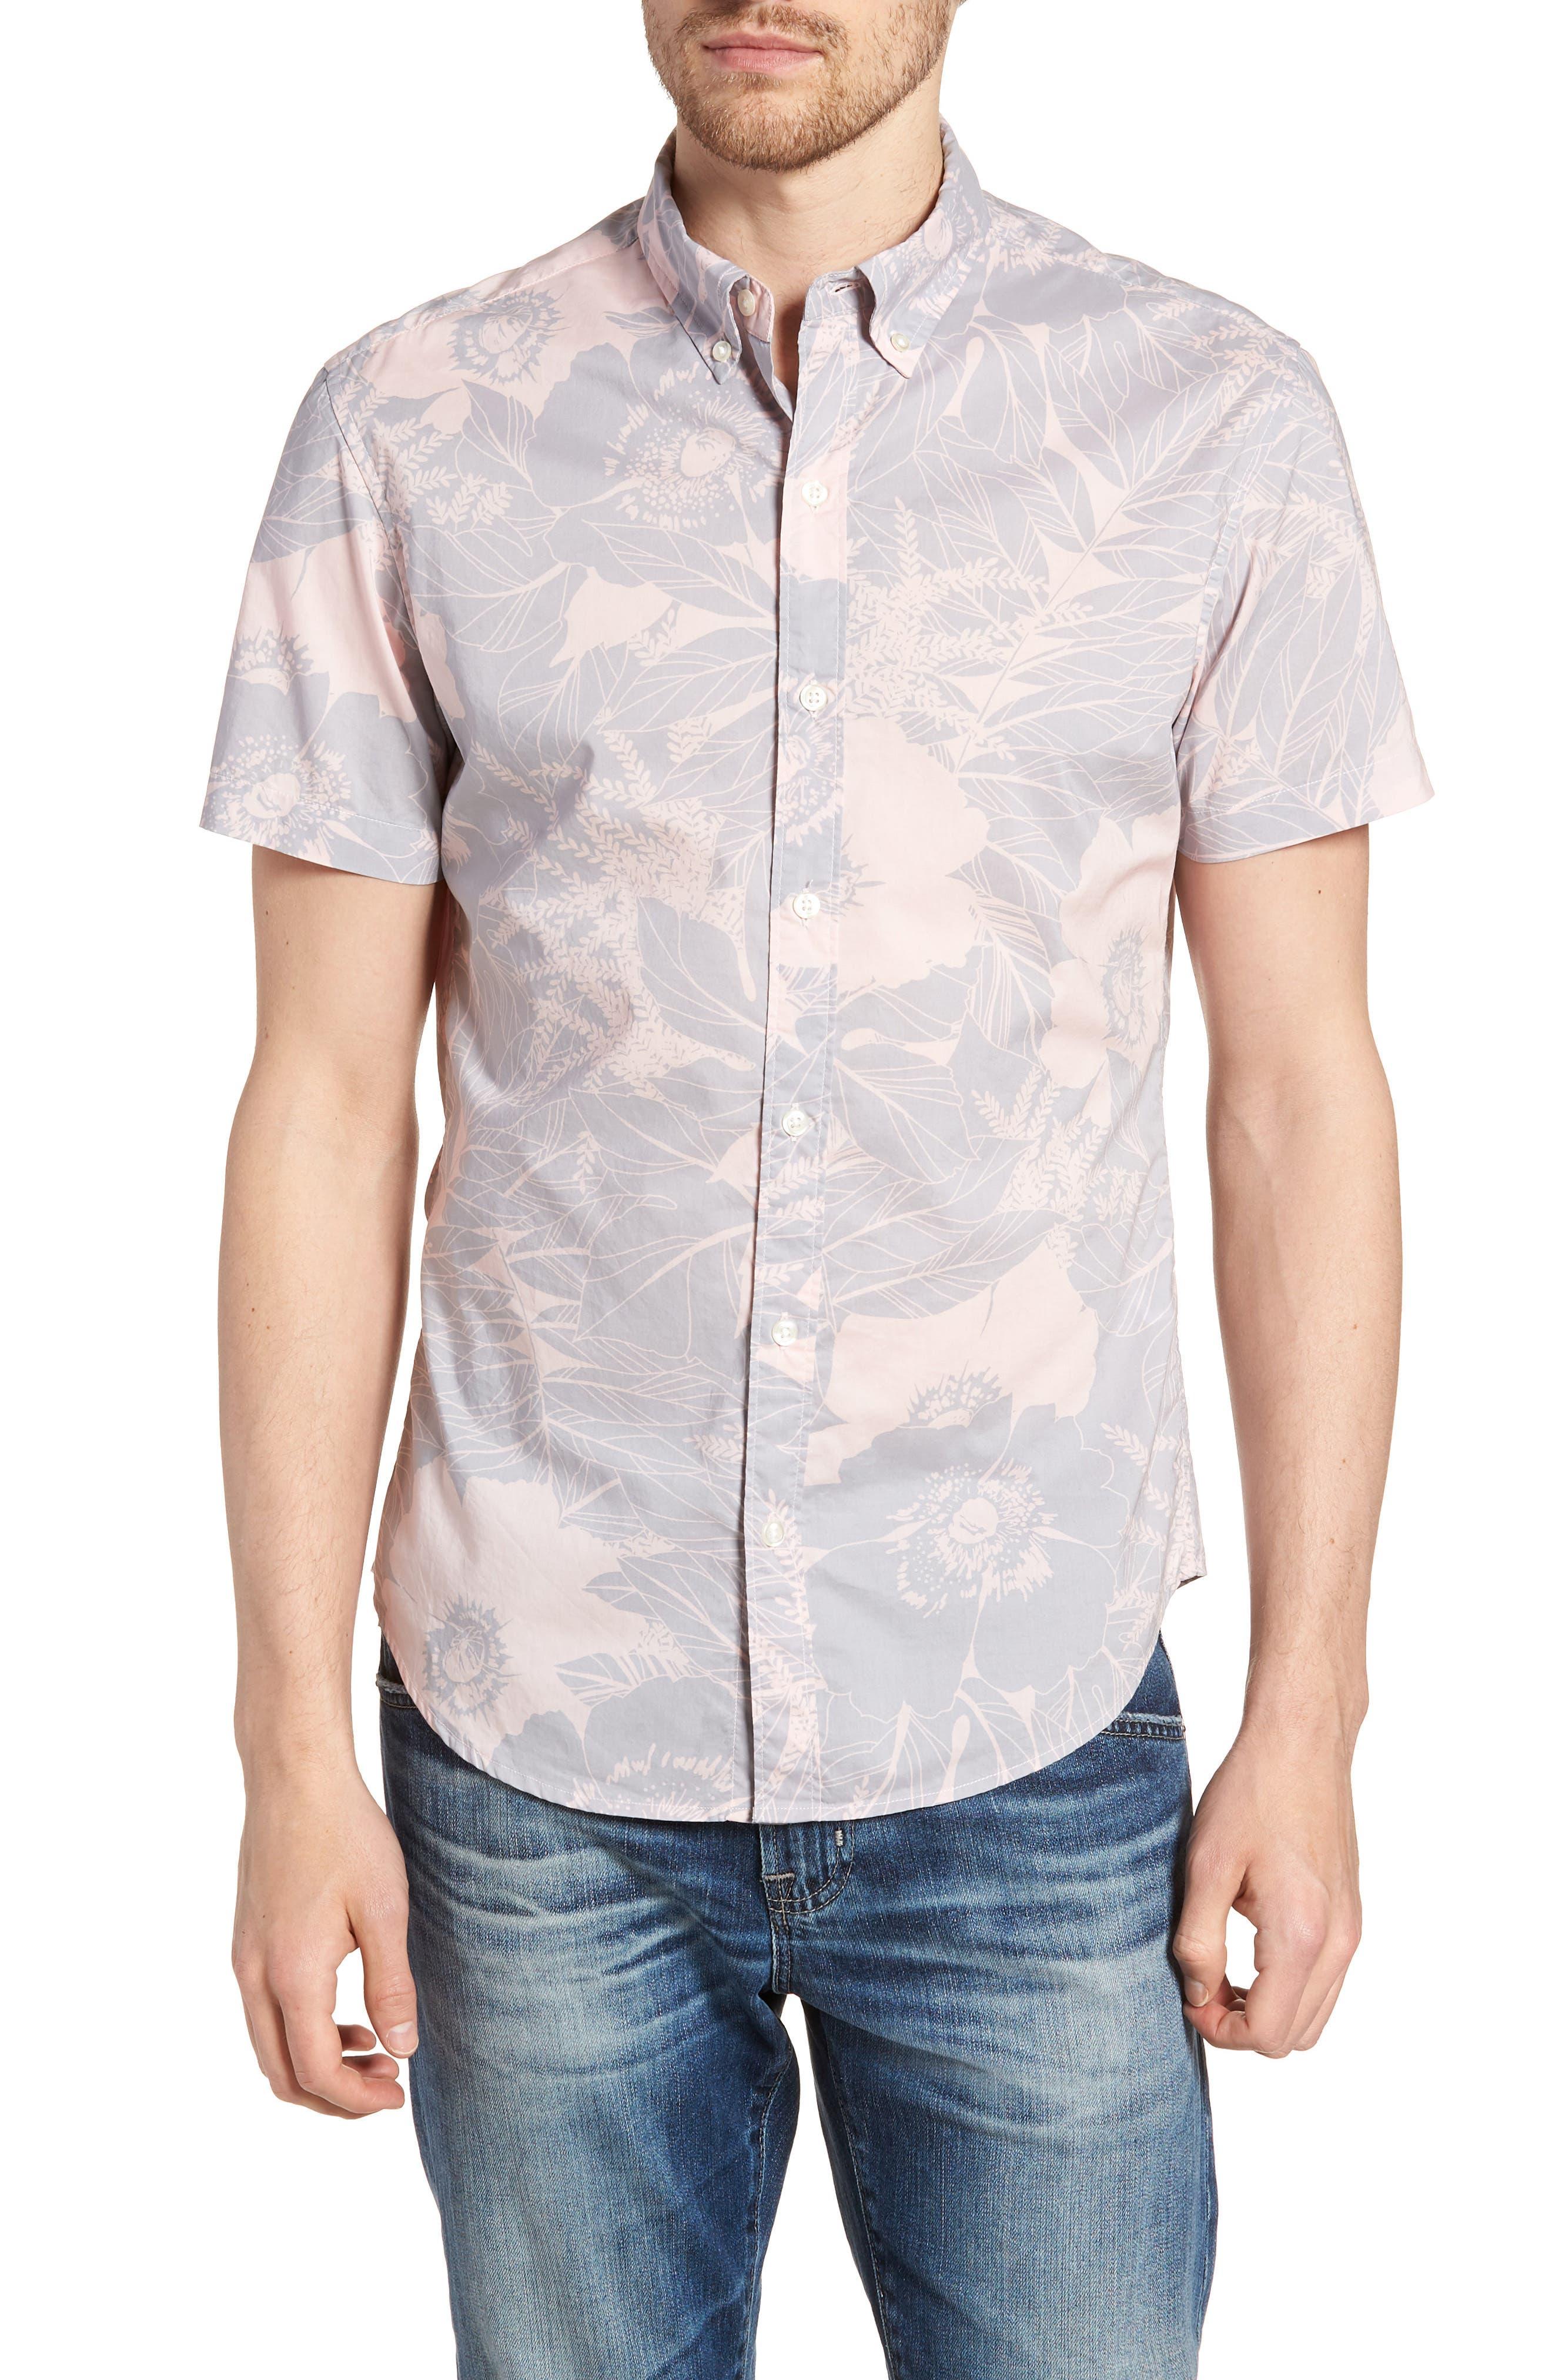 Riviera Slim Fit Floral Print Sport Shirt,                         Main,                         color, LINEAR FLORAL - SKIVVY PINK